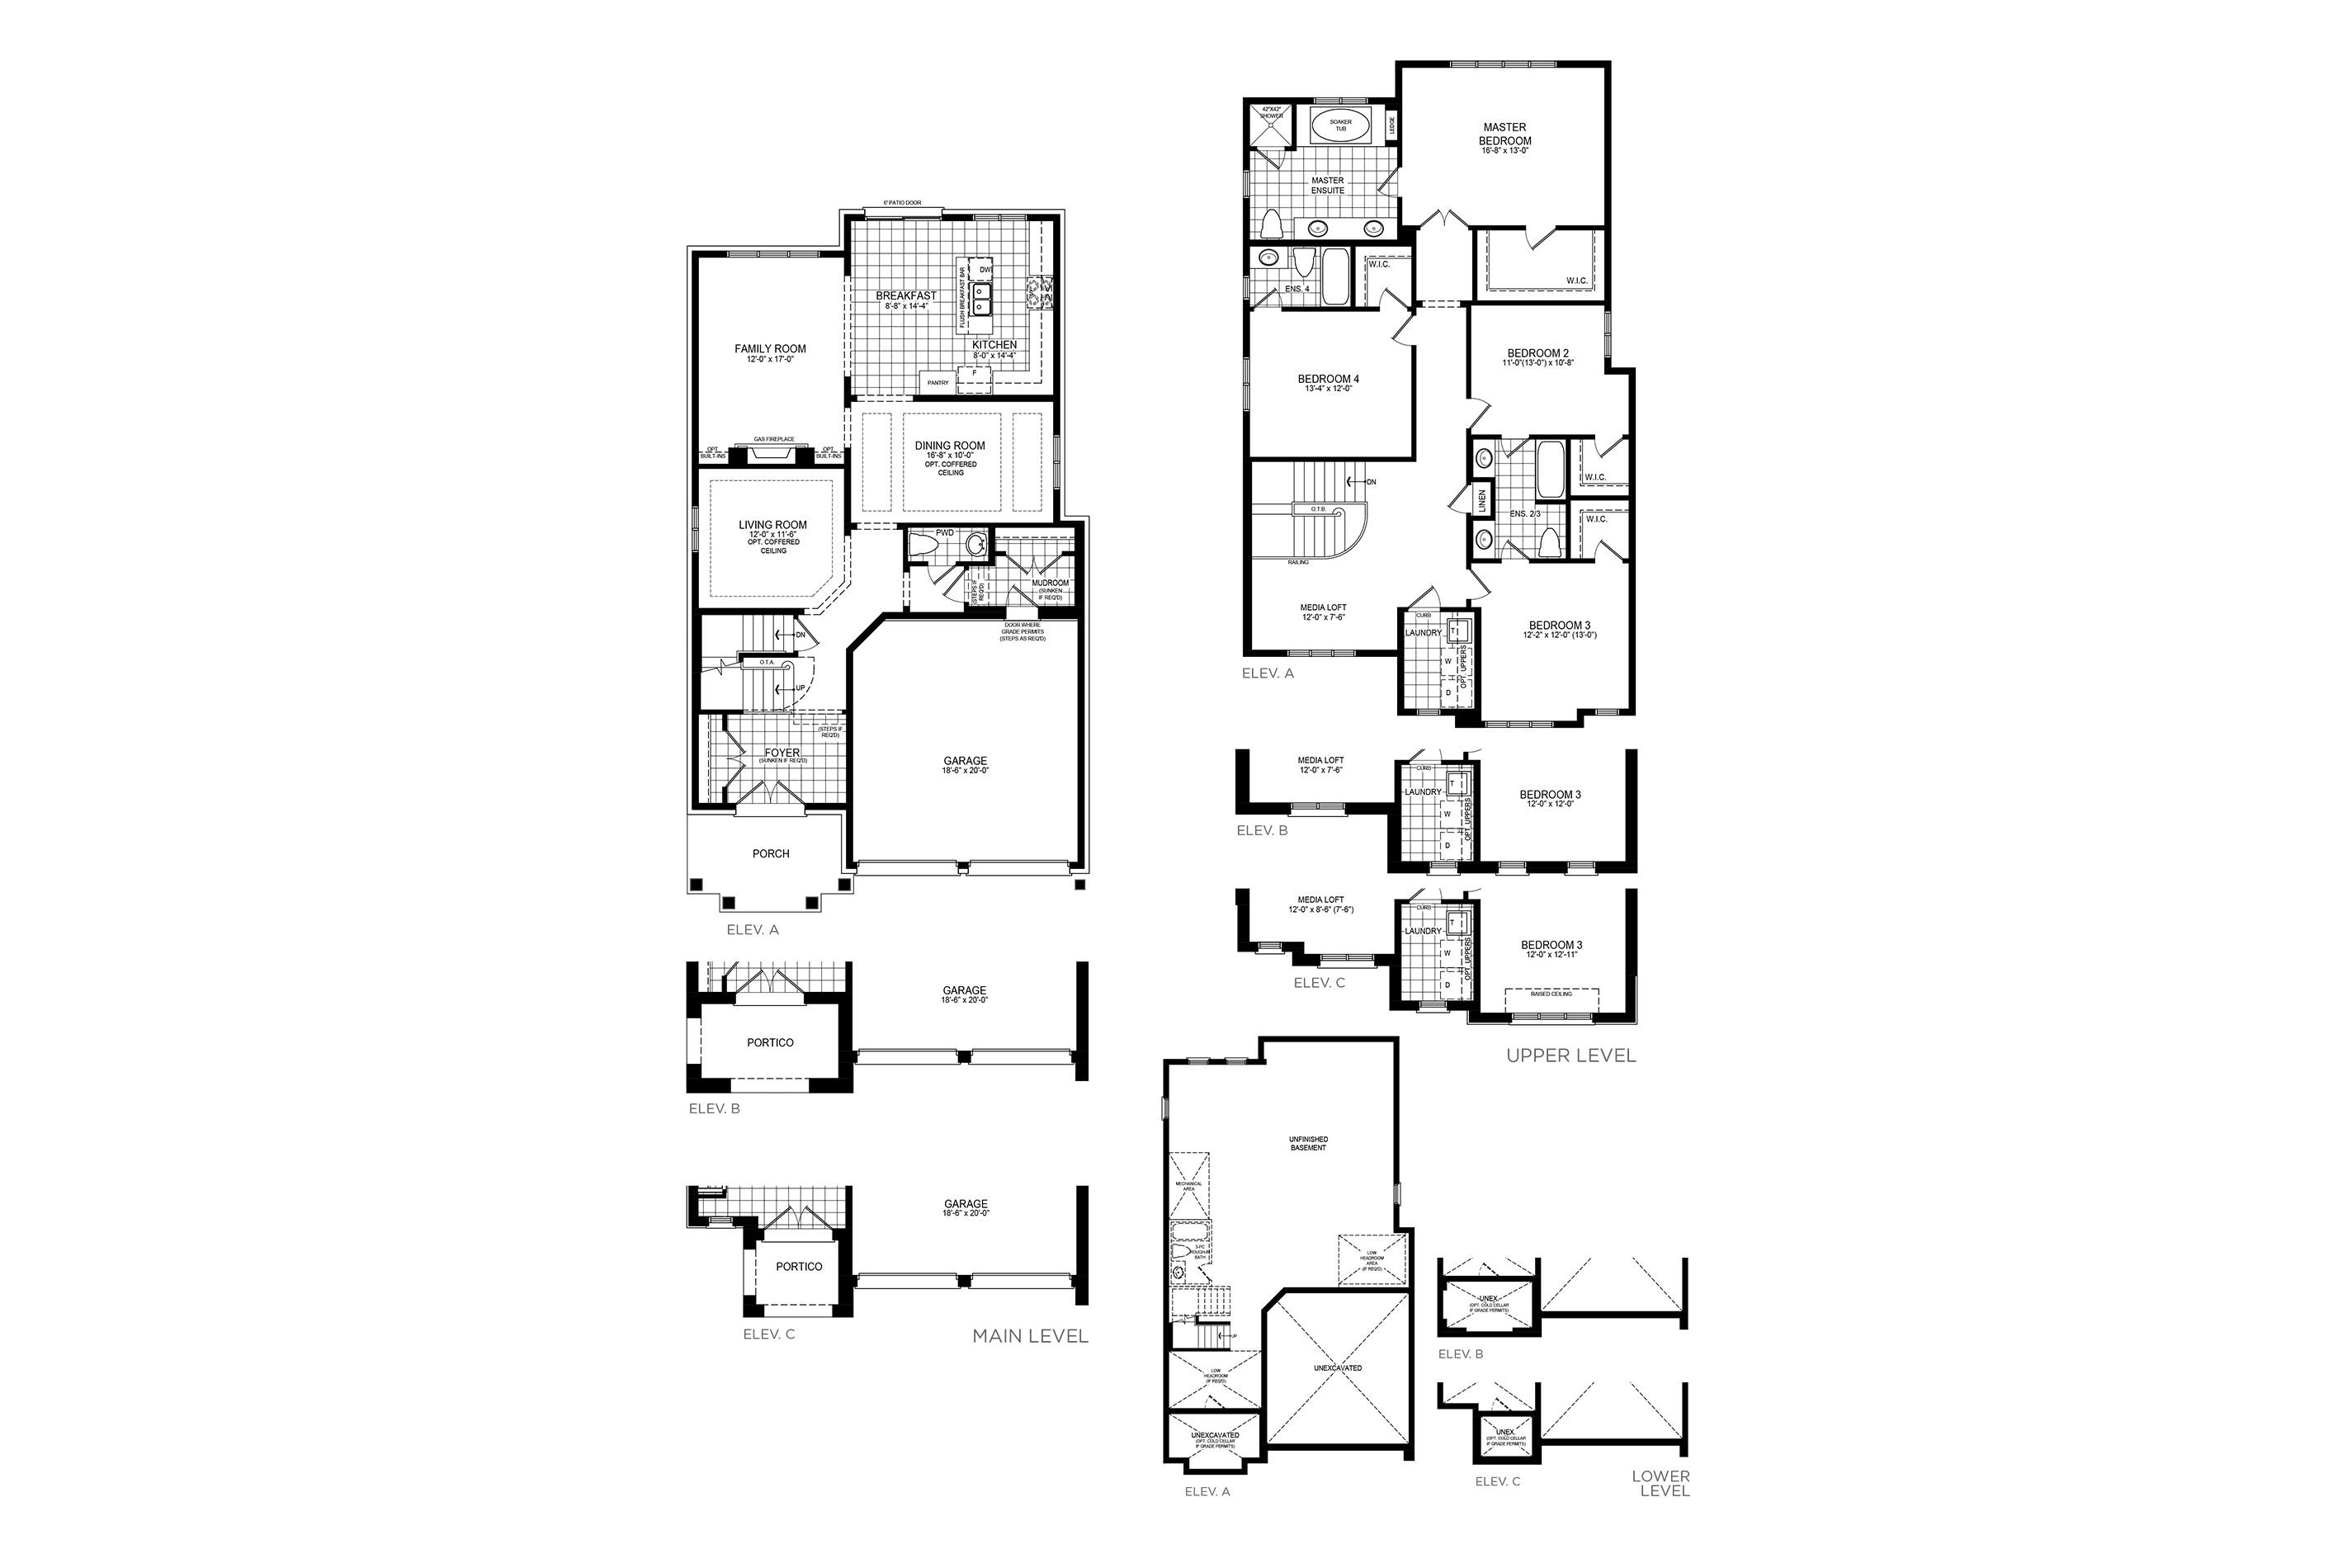 Kingsbury 8 Floorplan